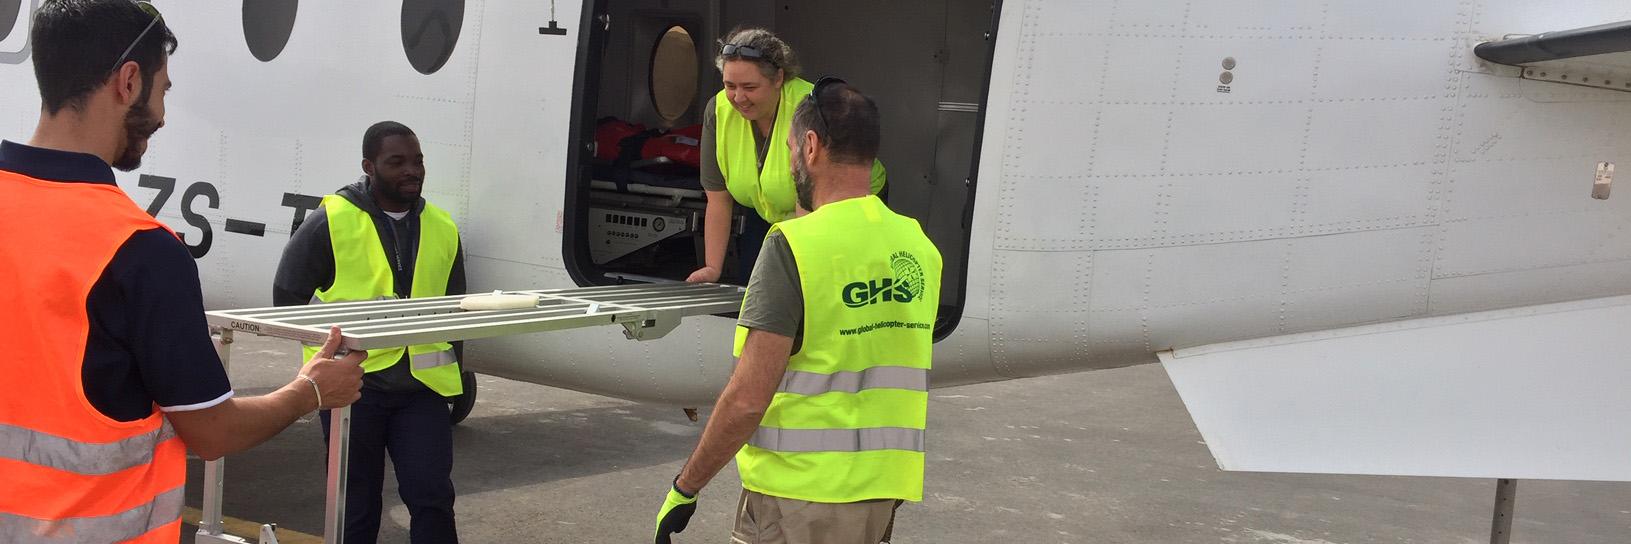 EDA deploys first civilian, fixed-wing aeromedical evacuation services